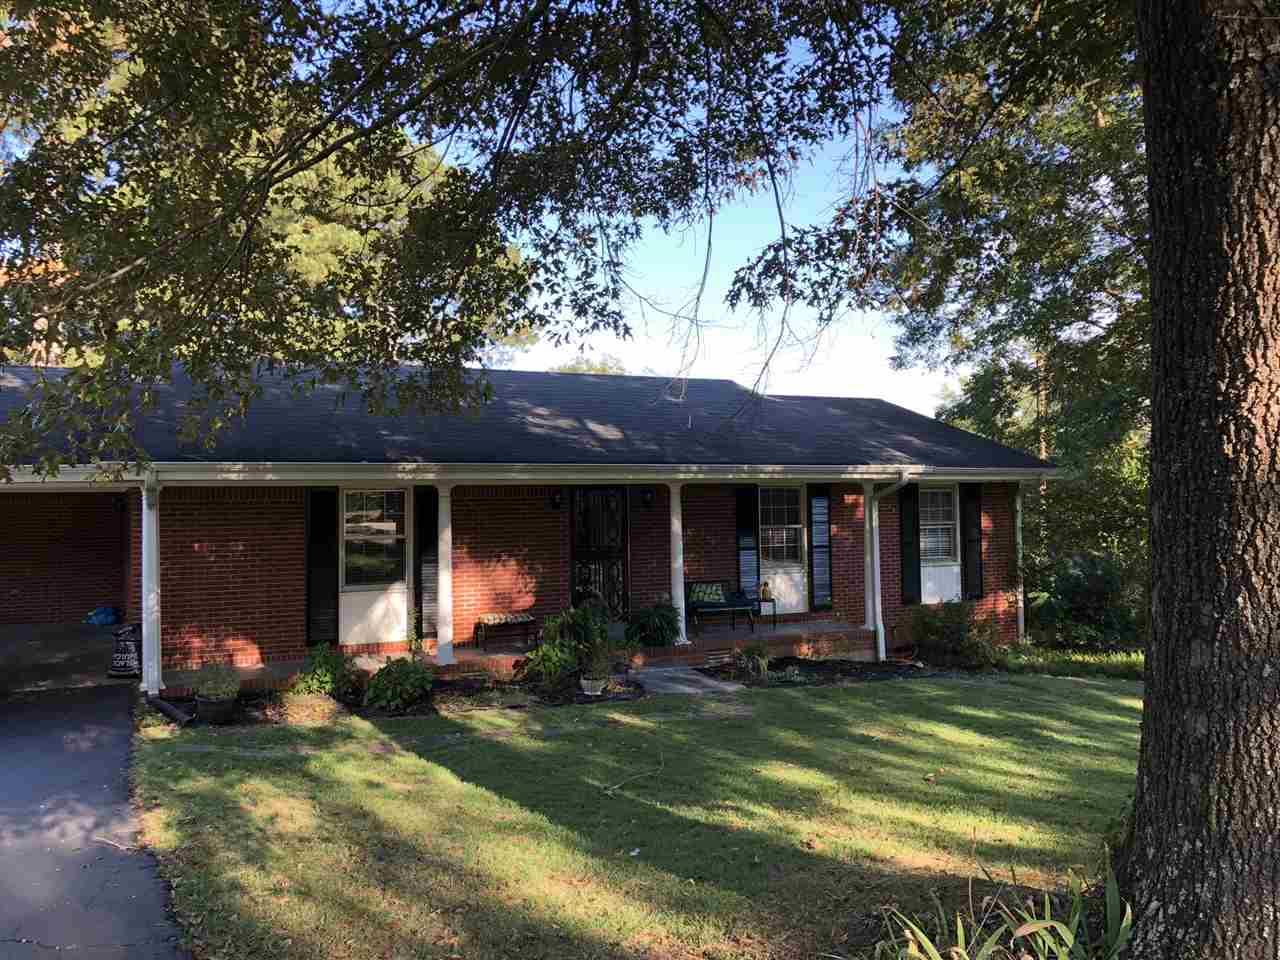 127 Hillhurst Selmer, TN 38375 - MLS #: 10012587